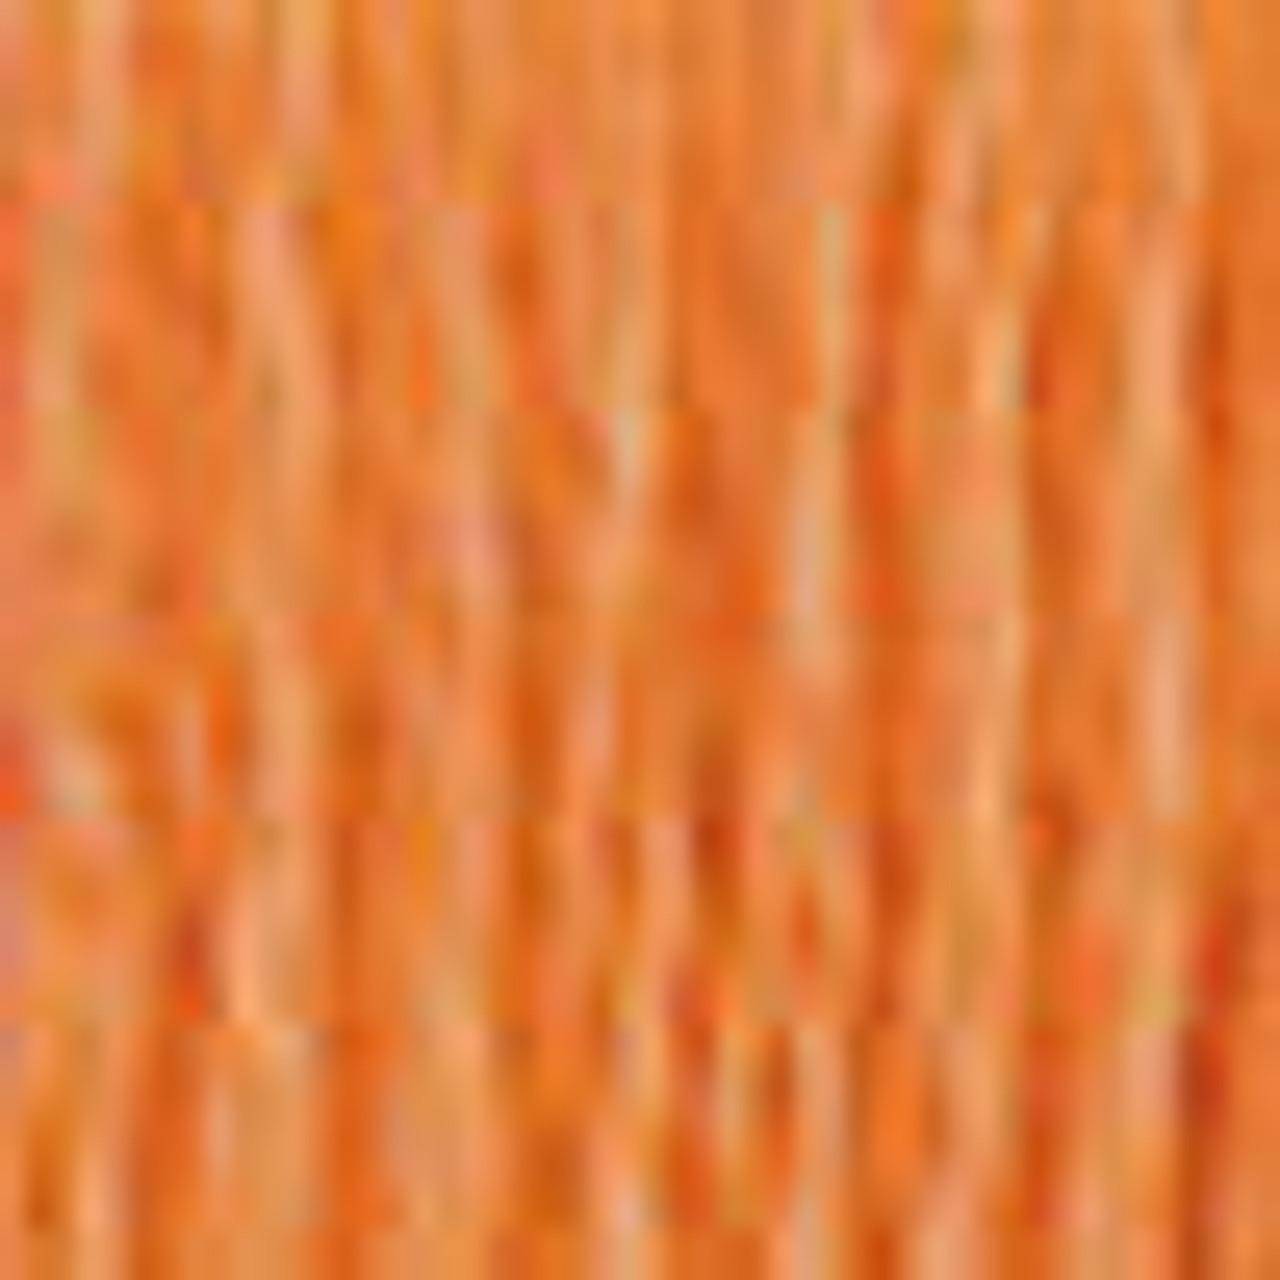 DMC # 922 Light Copper Floss / Thread